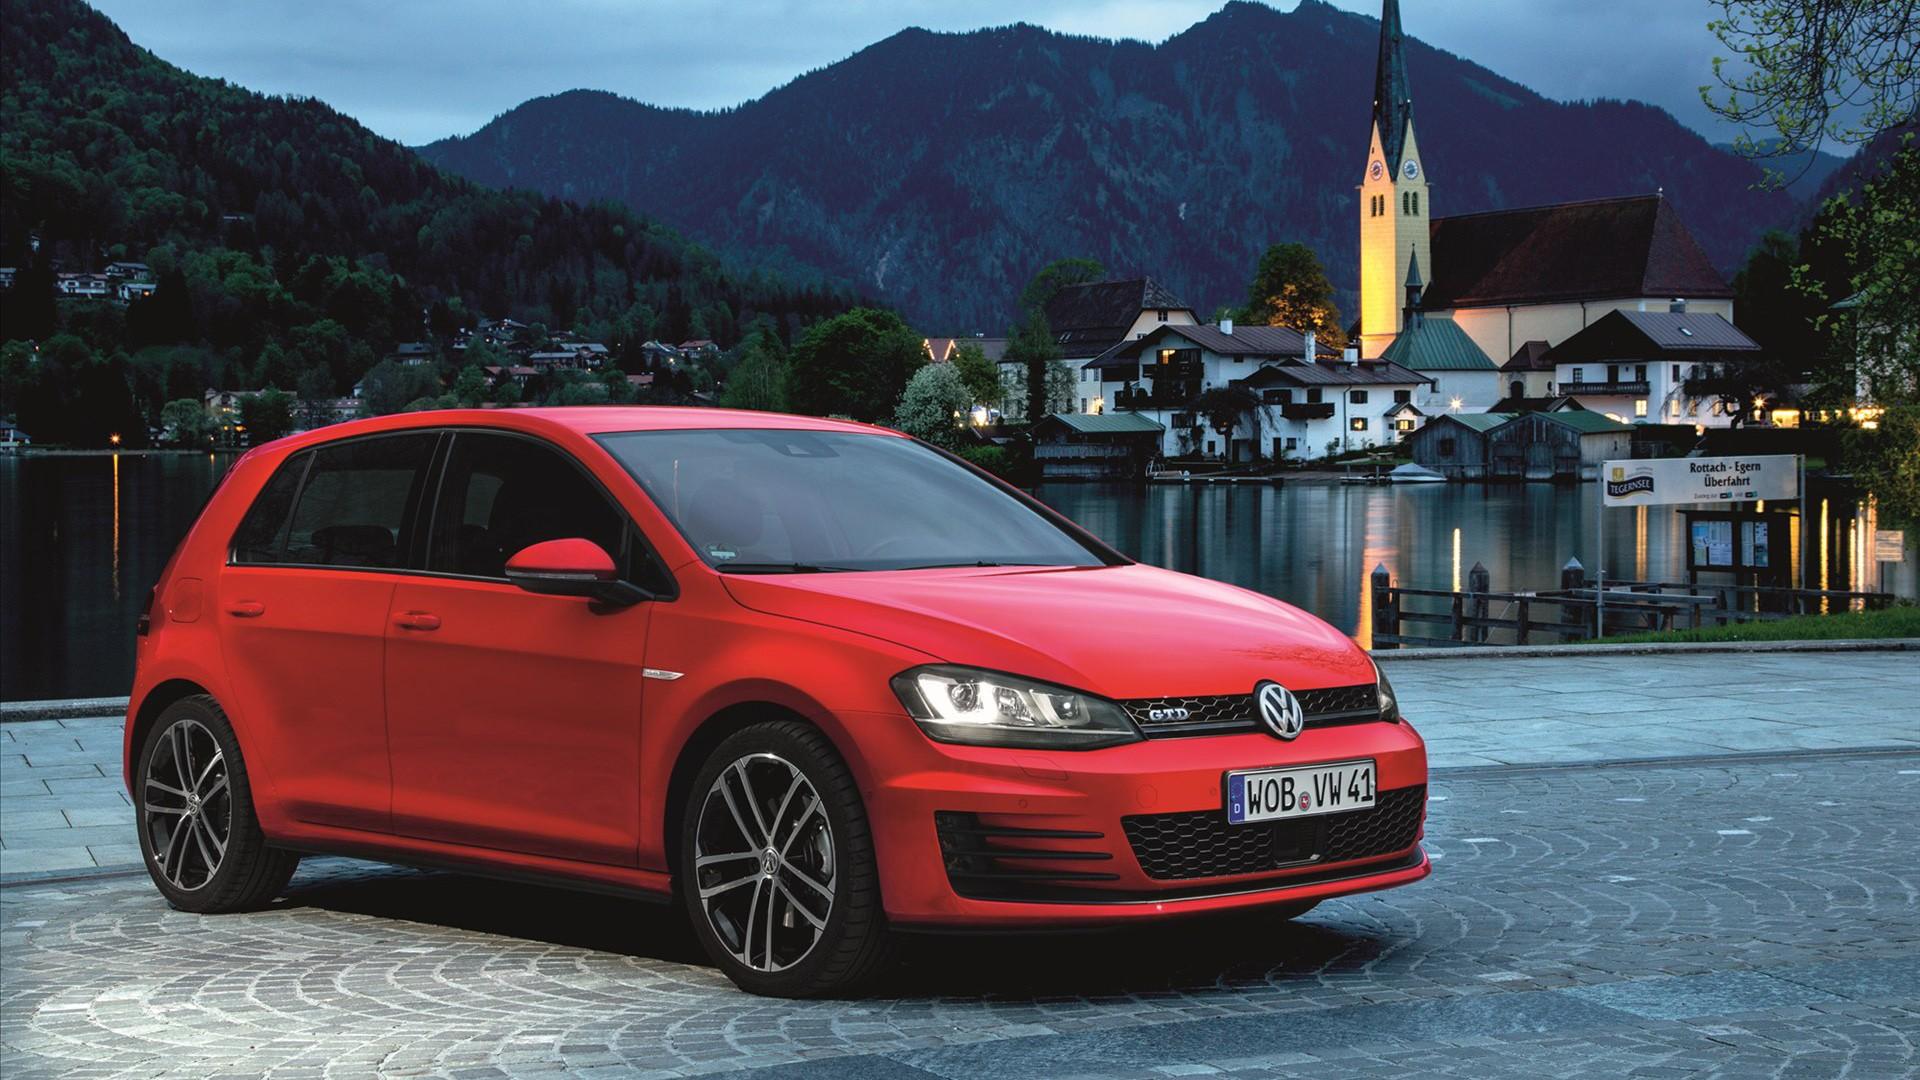 Gtd Iphone Wallpaper 2014 Volkswagen Golf Gtd Wallpaper Hd Car Wallpapers